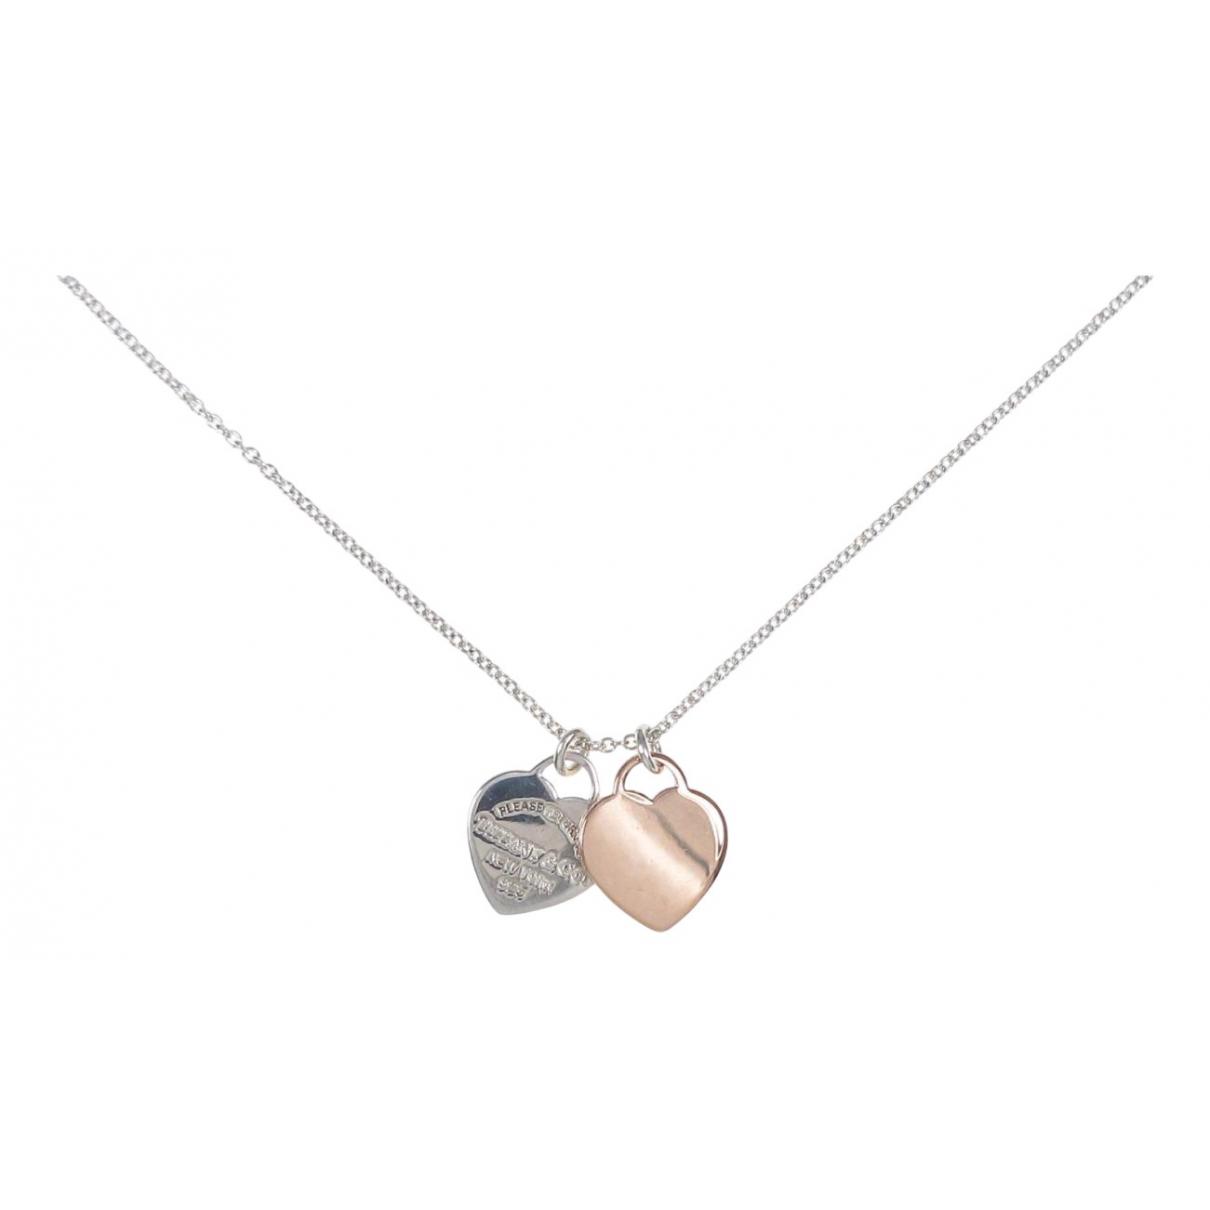 Tiffany & Co Return to Tiffany Kette in  Silber Silber